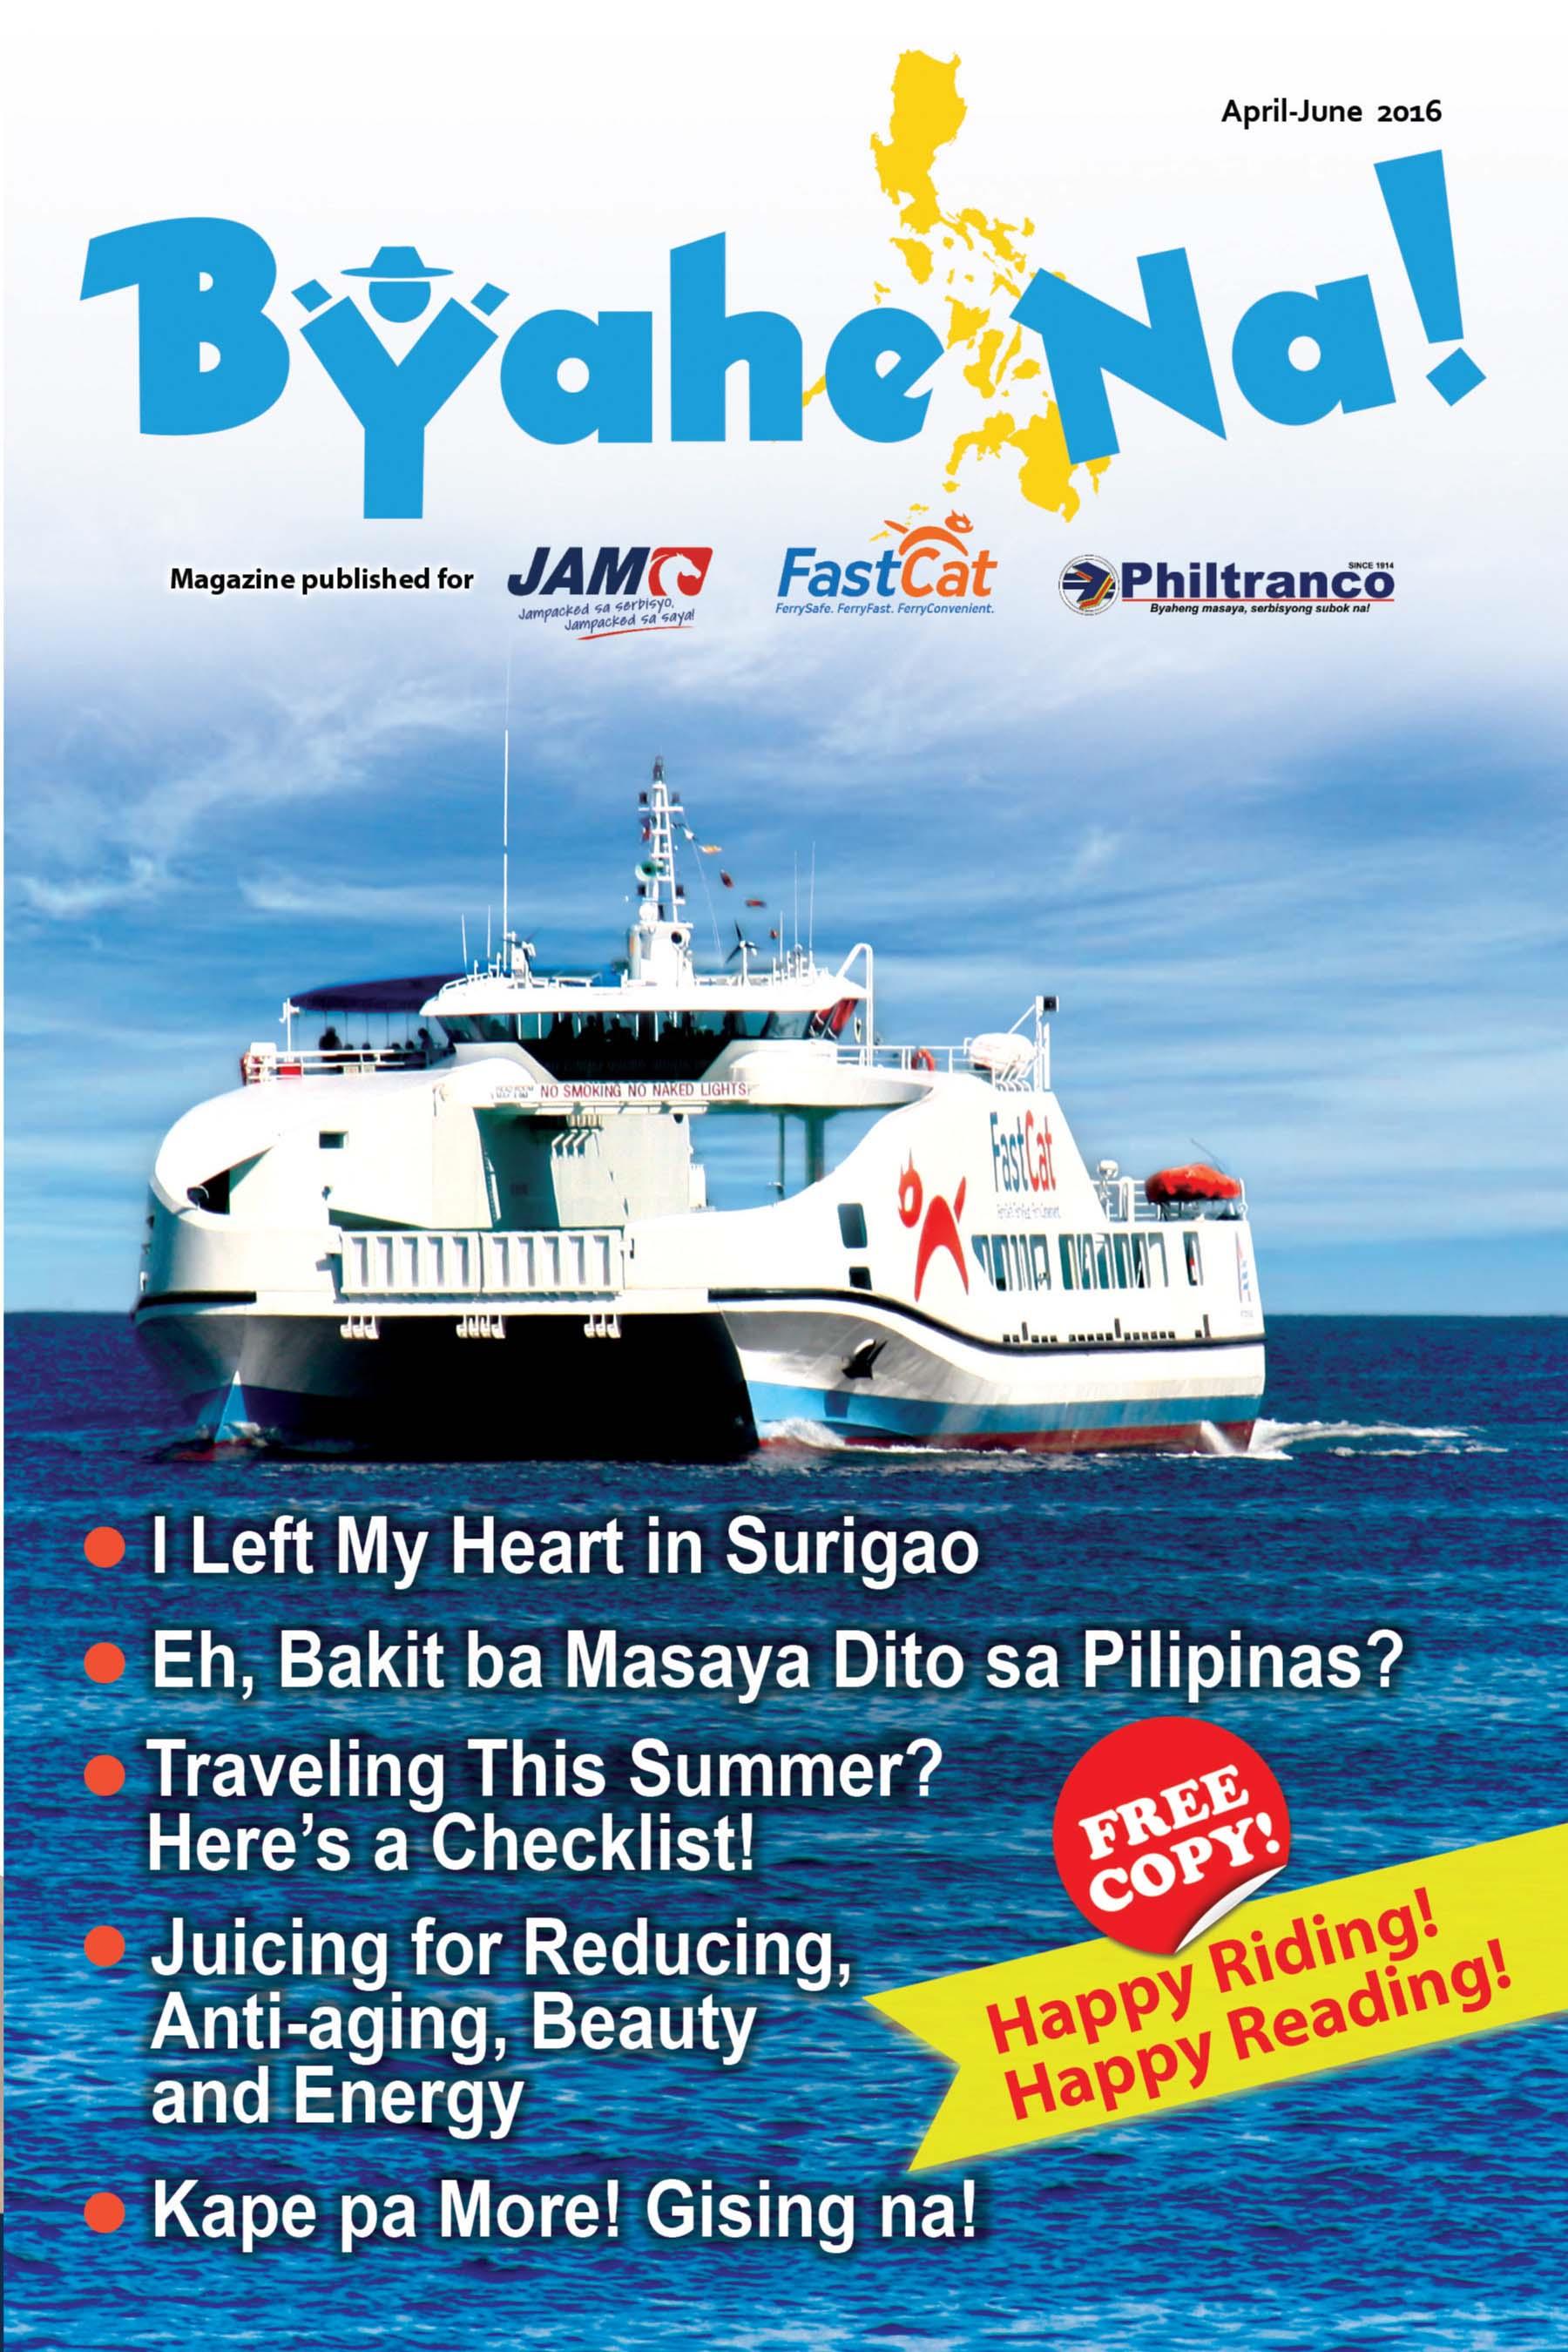 Byahe Na! 9th issue